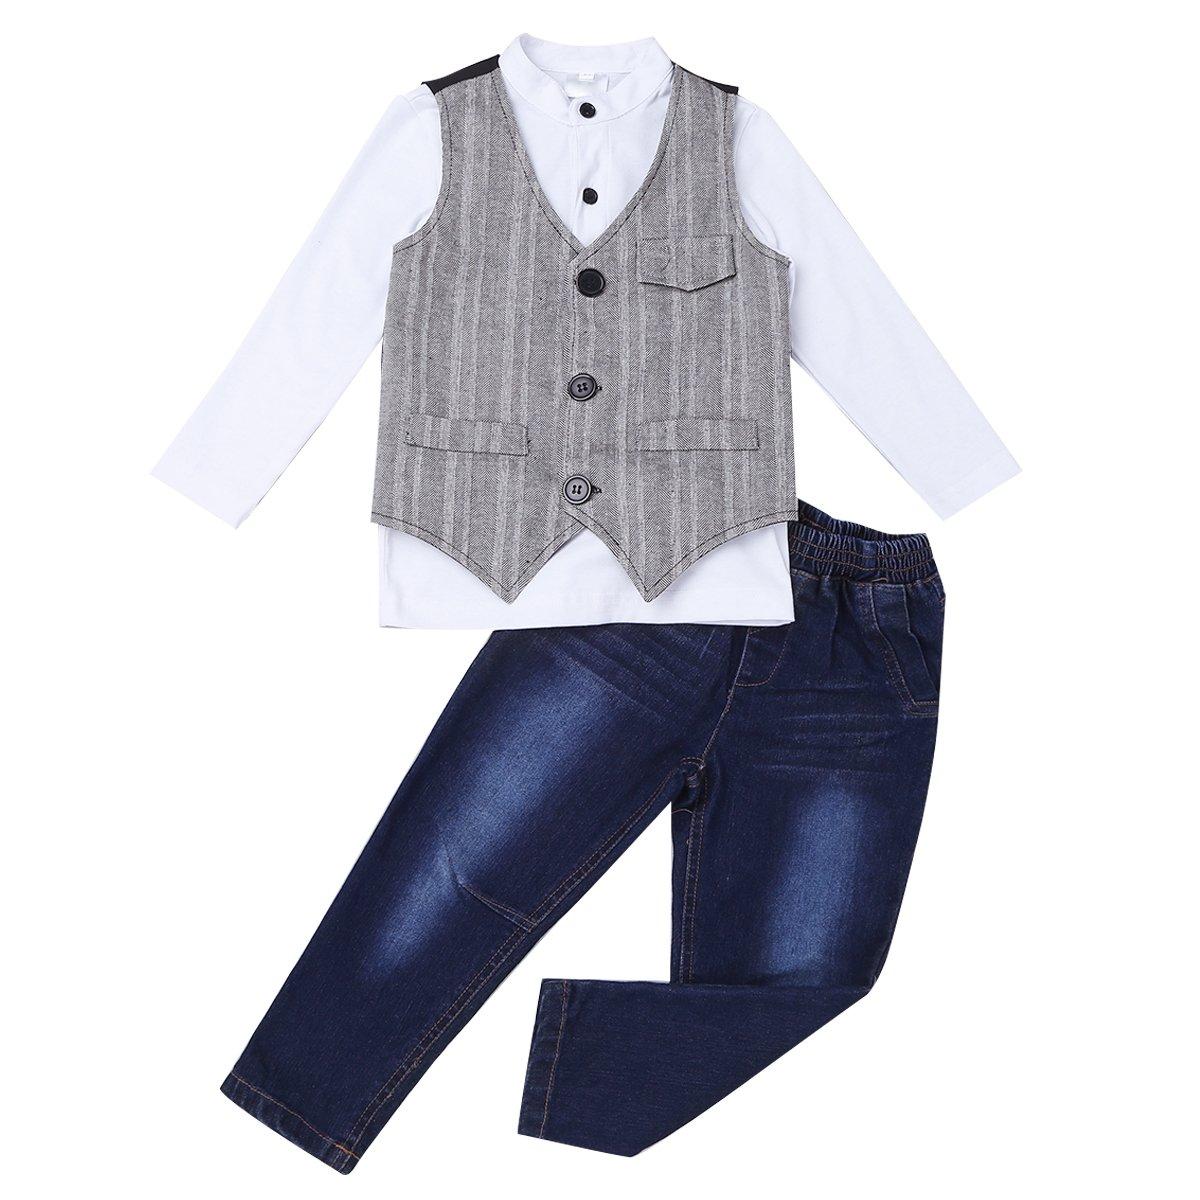 iiniim 3Pcs Kids Boys Gentleman Suit Waistcoat Vest Top Shirt with Jeans Pants Long Trousers Outfit Set White&Blue&Gray 3